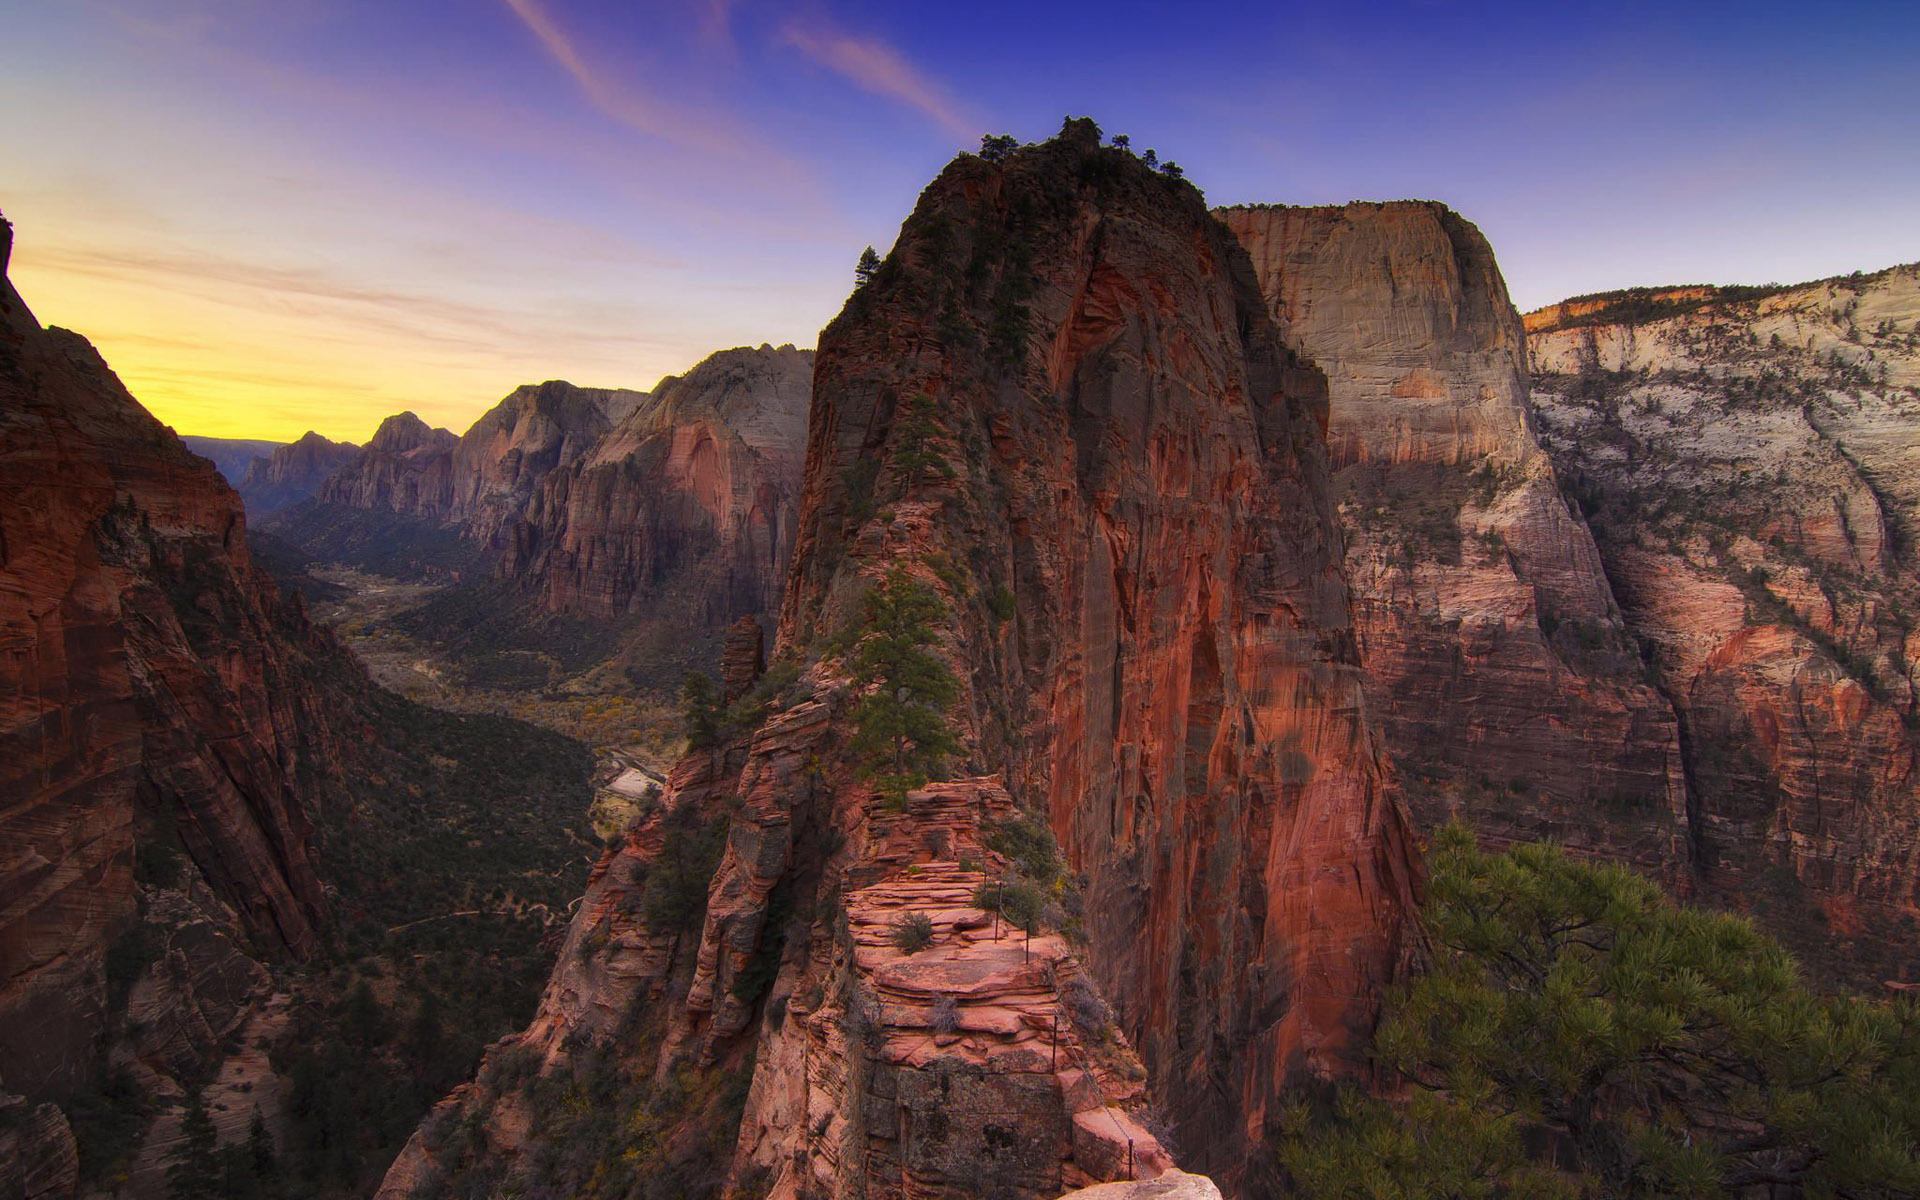 4k Fall Mountain Wallpaper Zion National Park Wallpapers Hd Pixelstalk Net